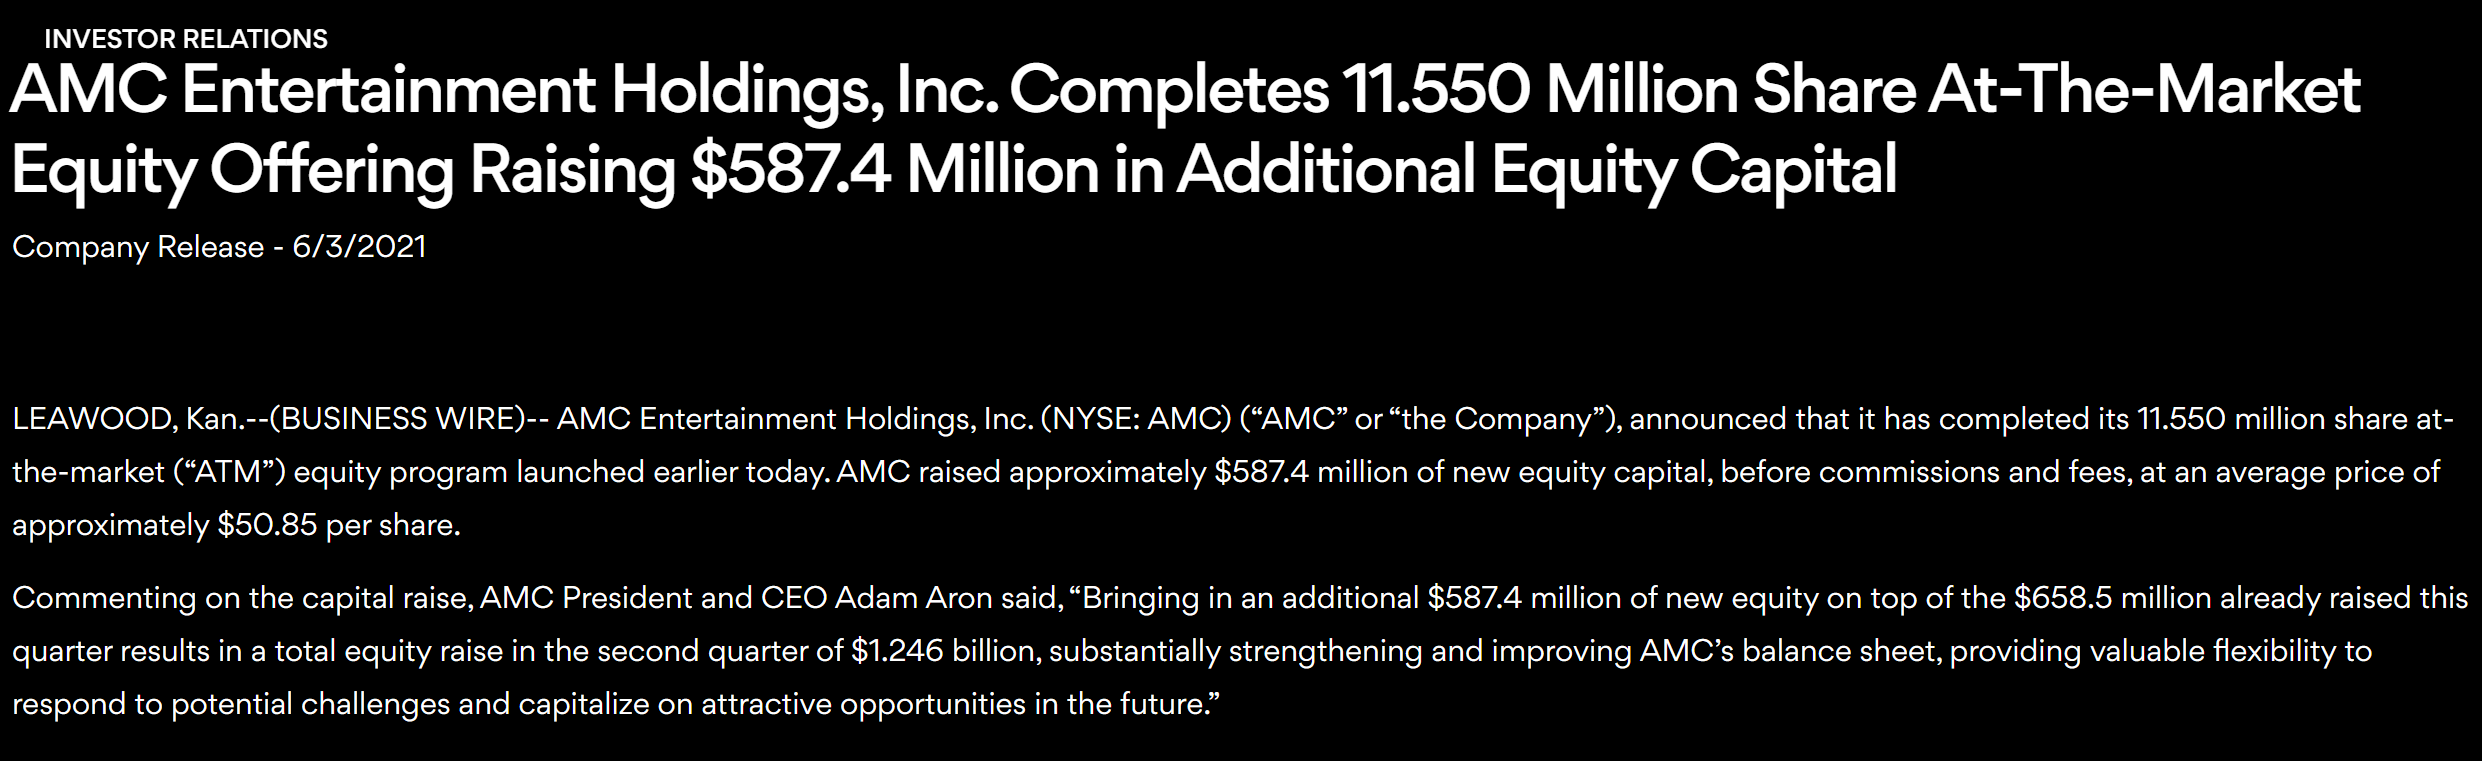 AMC院线再度完成大额股票出售 本季度狂揽12亿美元